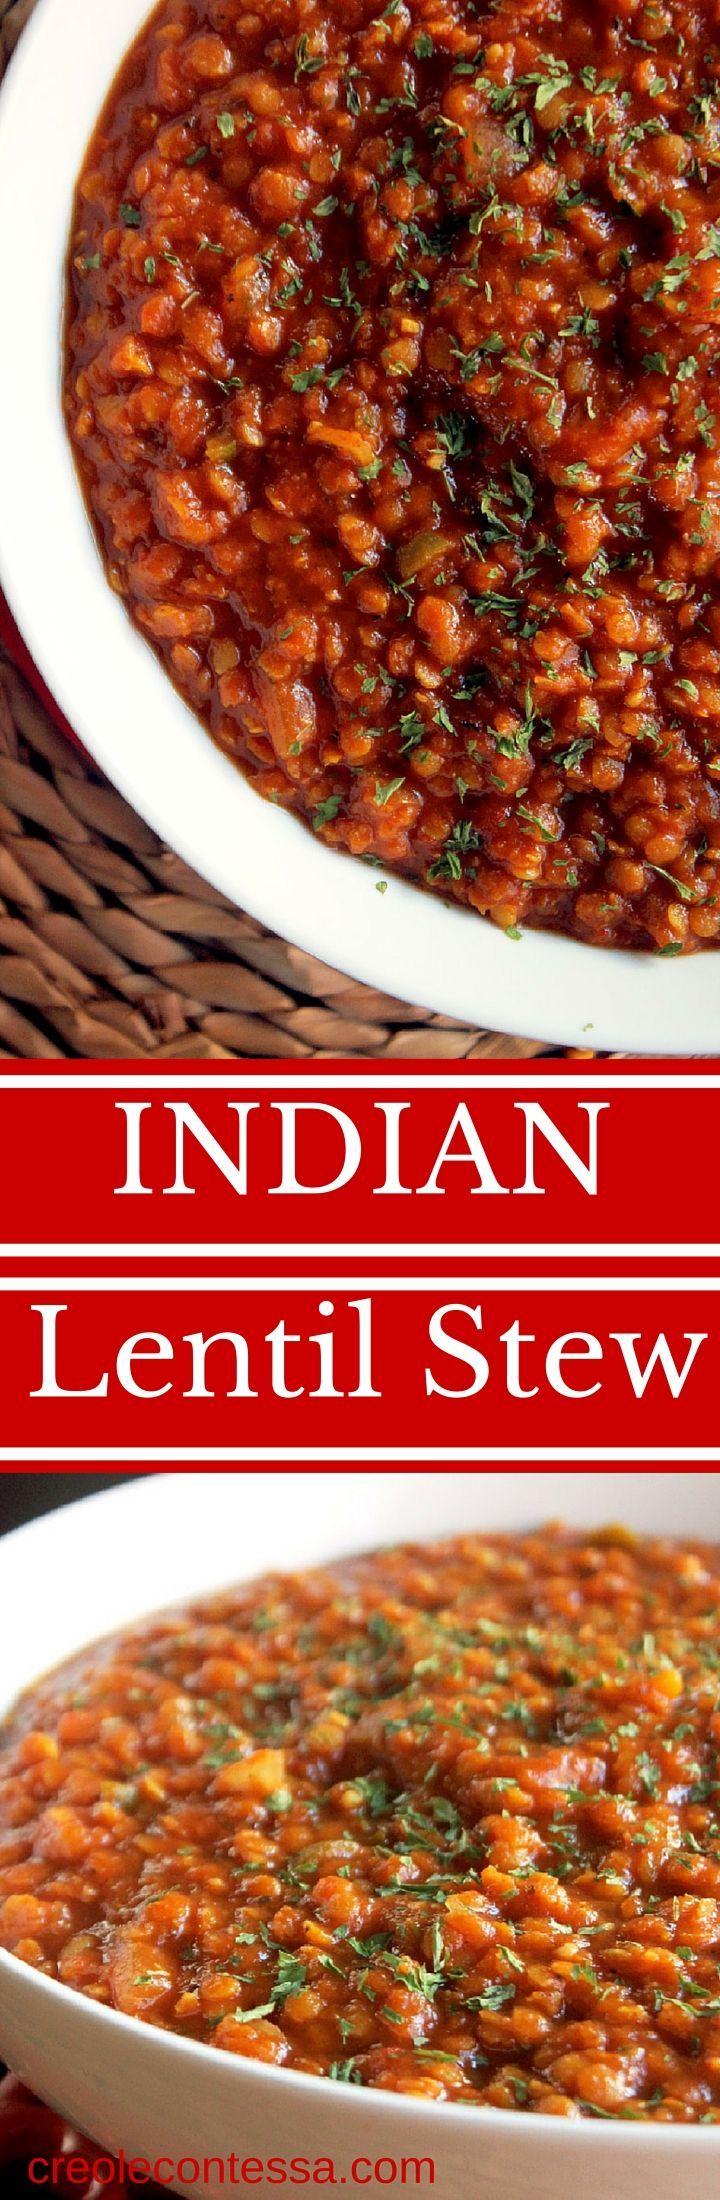 Slow Cooker Indian Lentil Stew-Creole Contessa #slowcooker #vegan #vegetarian #crockpot #indian